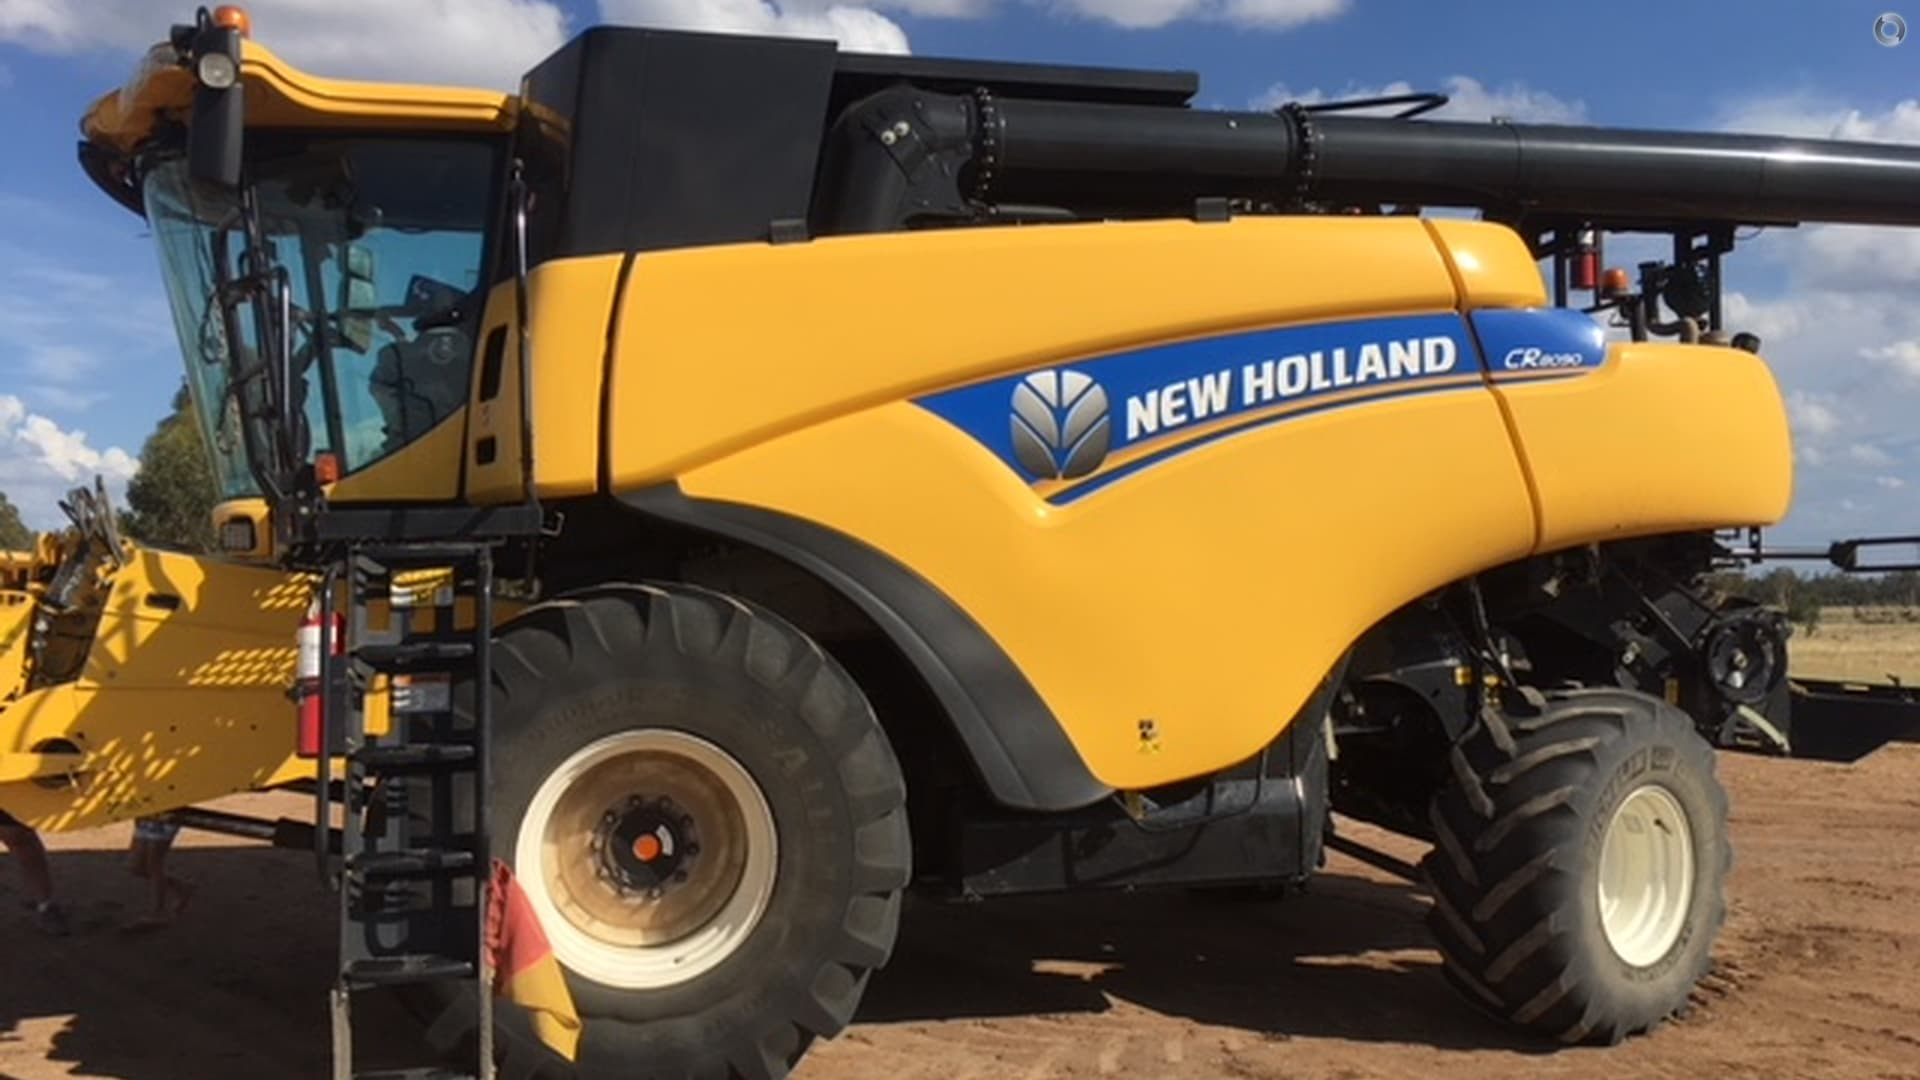 2014 New Holland CR8090 Combine Harvester